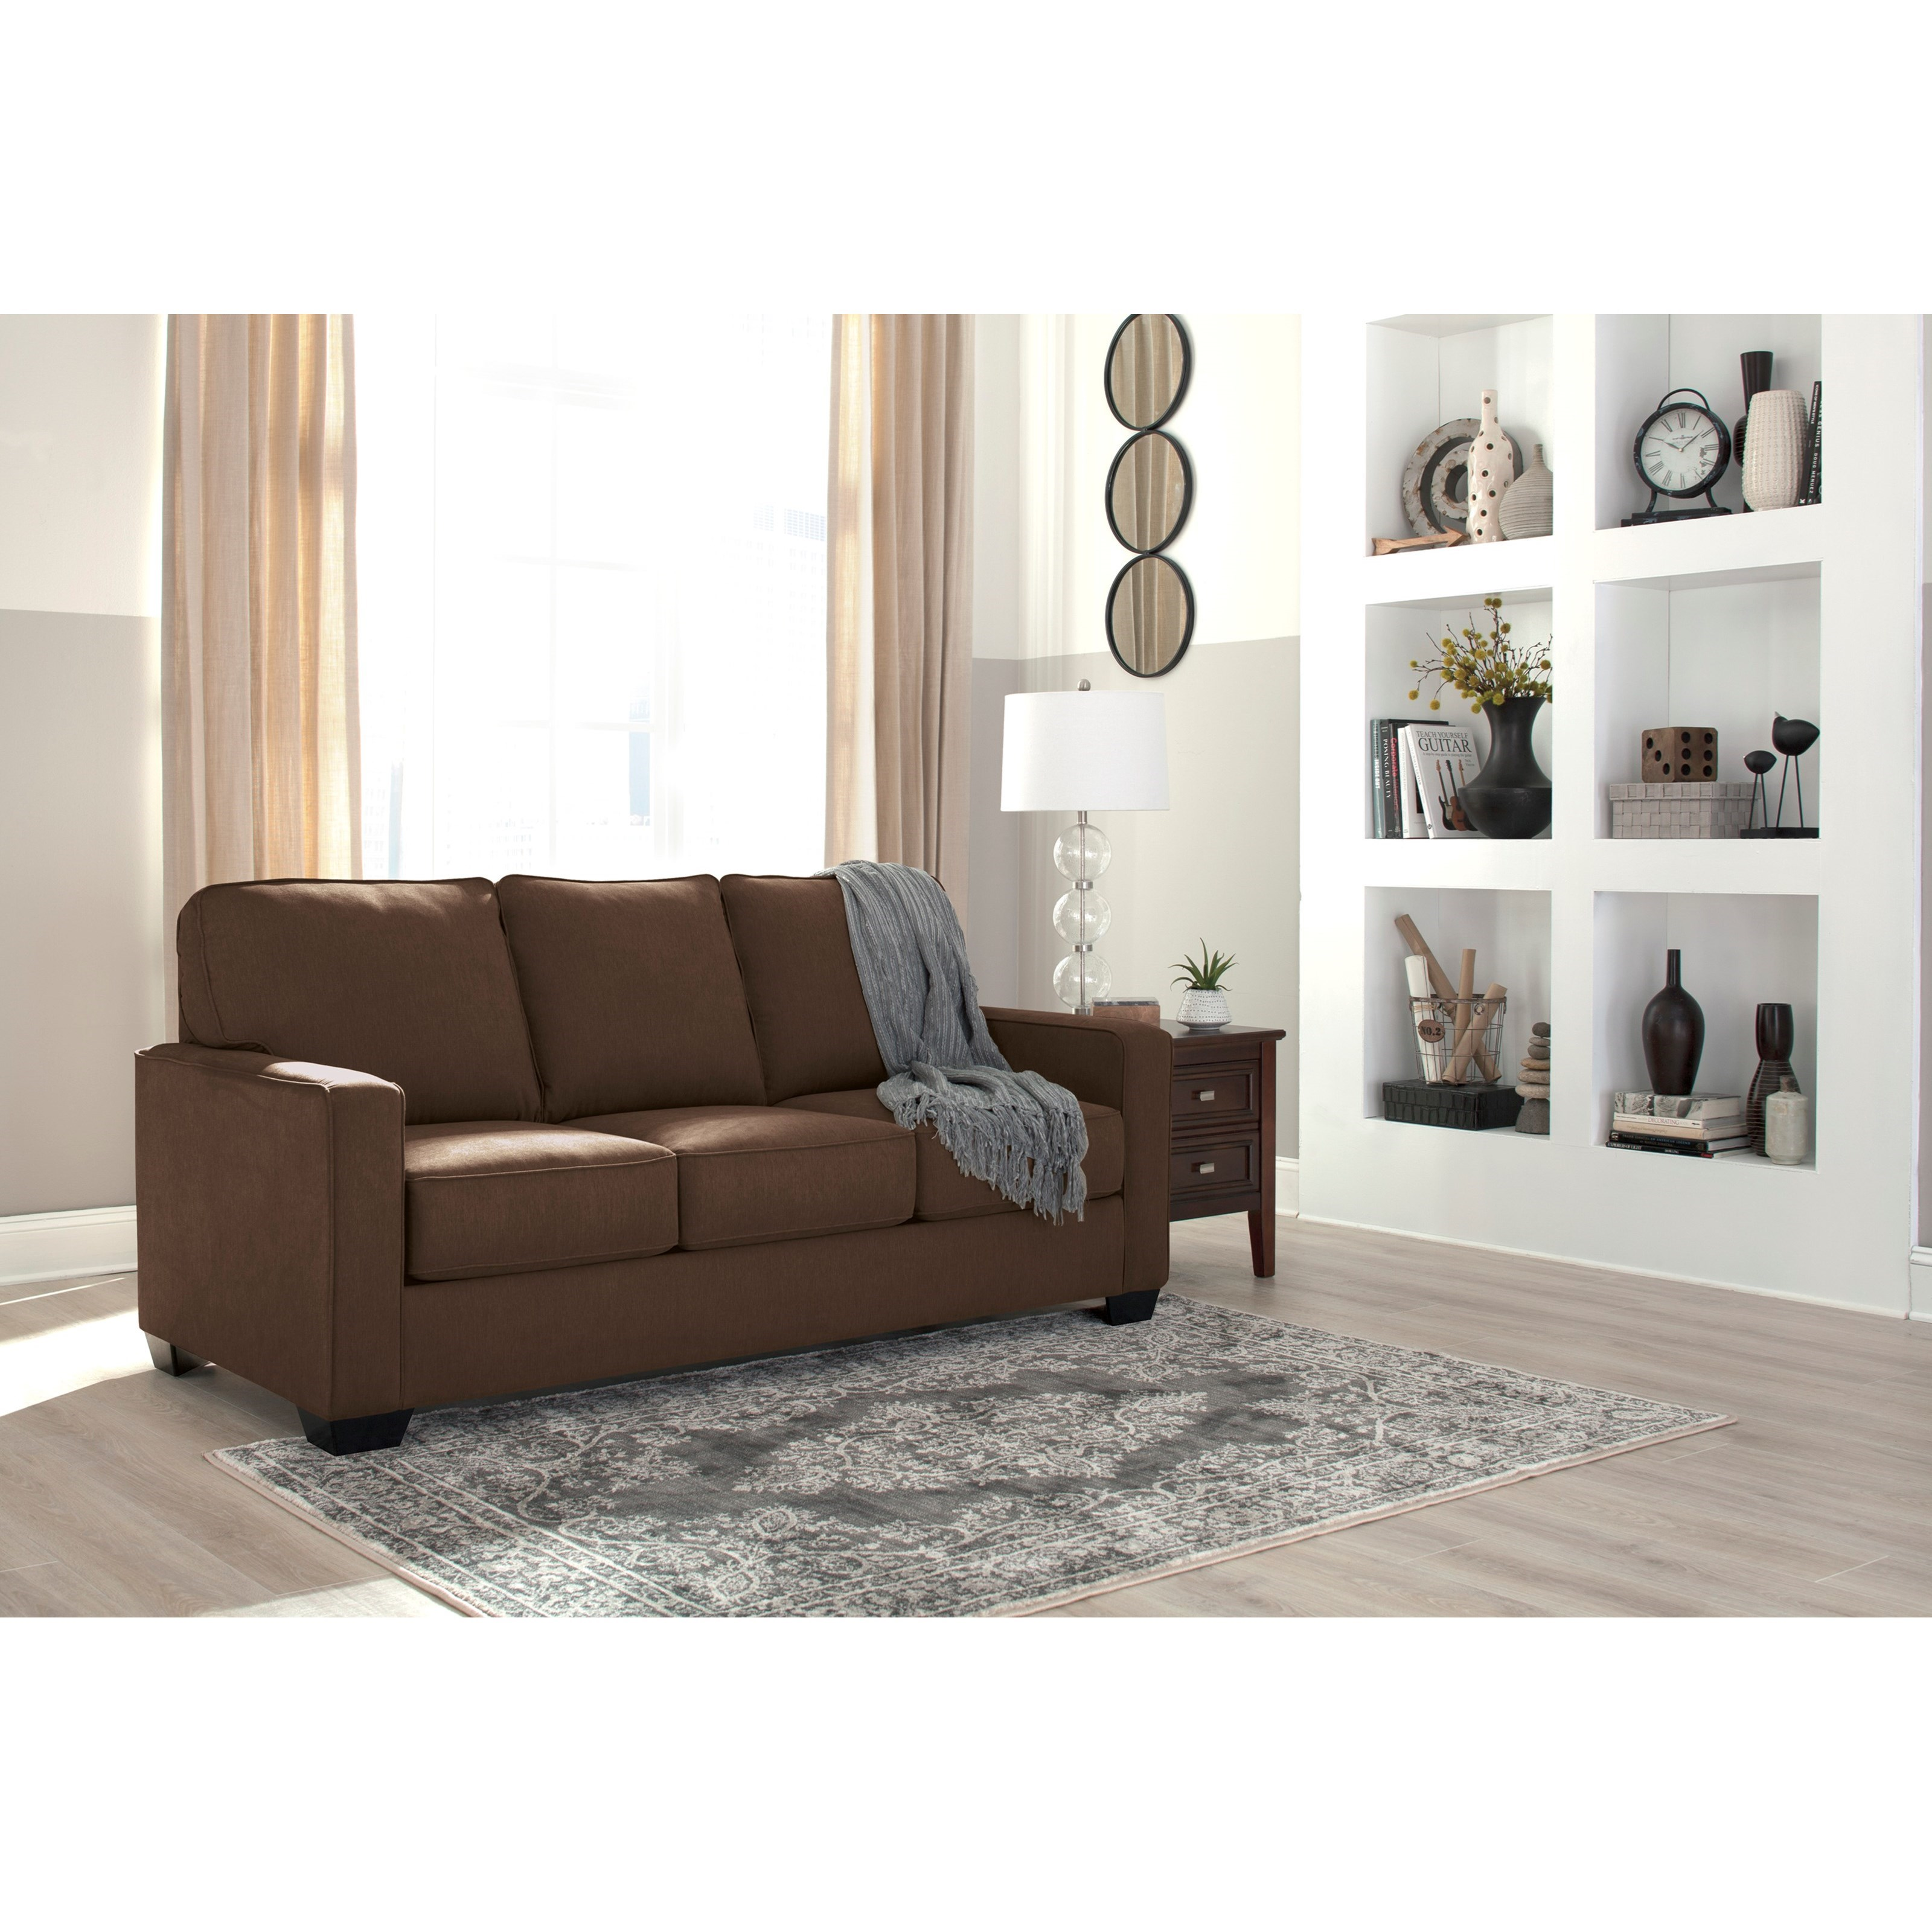 Signature Design By Ashley Zeb Full Sofa Sleeper With